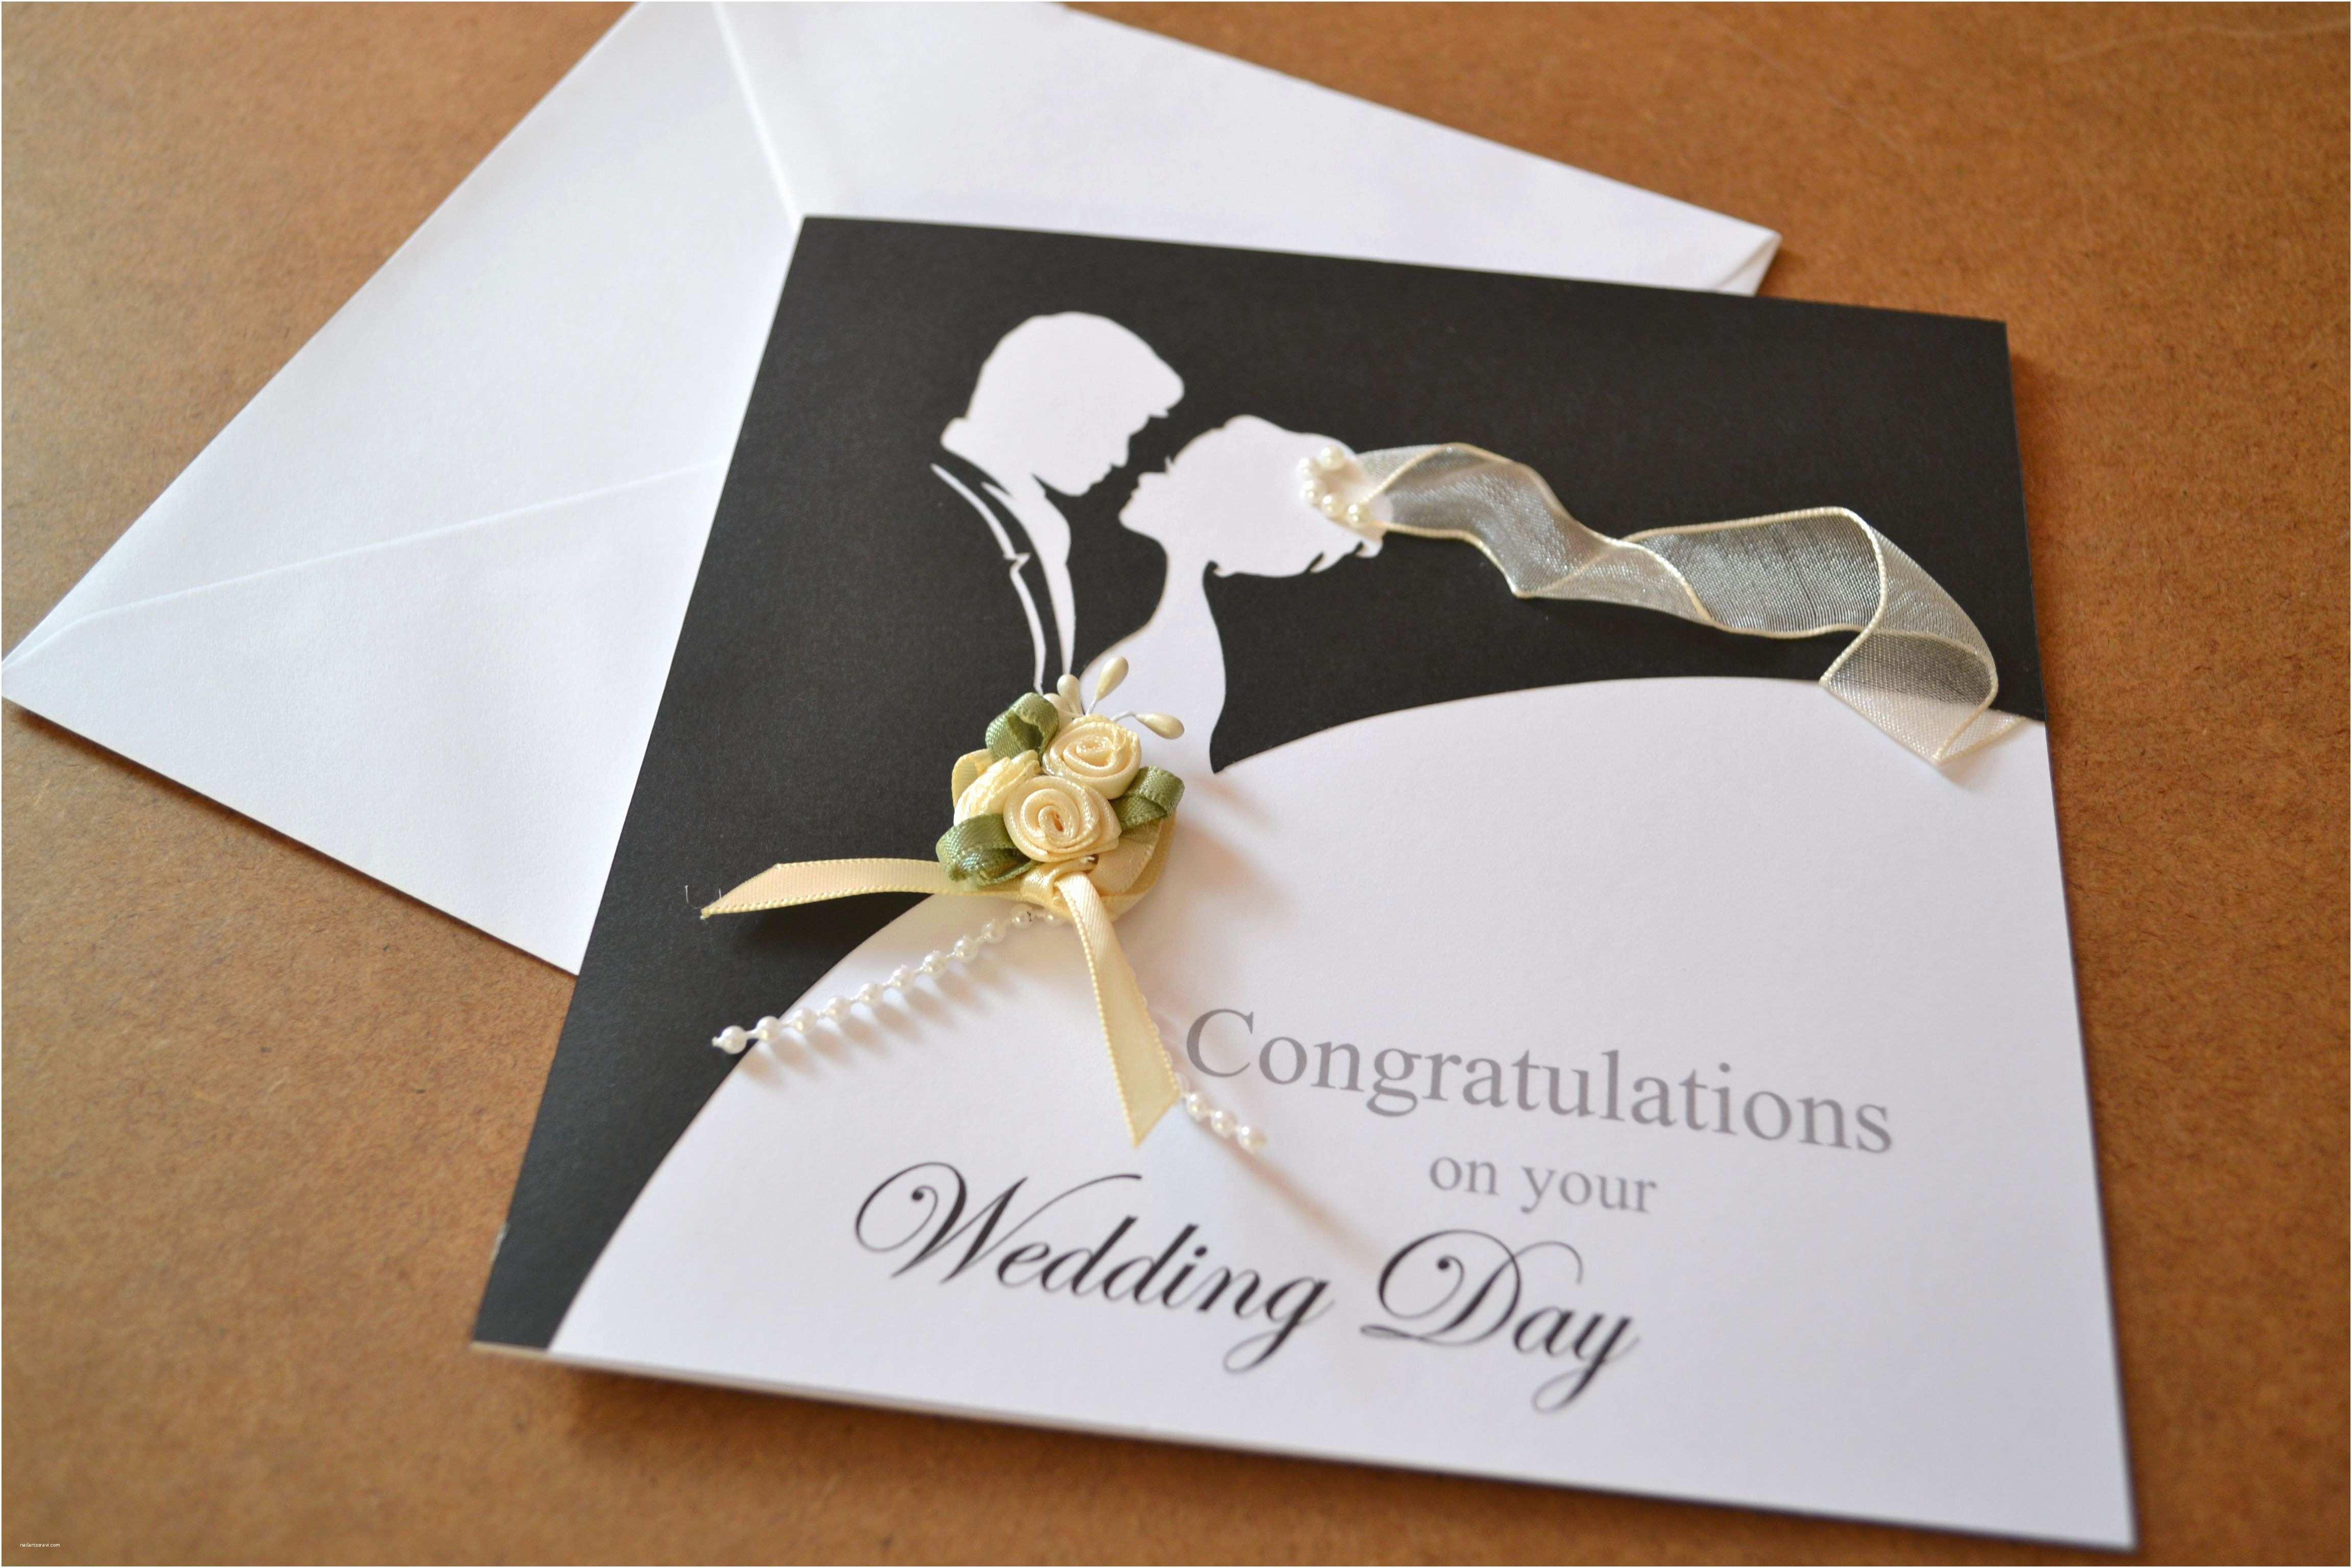 How to Design Wedding Invitations Design Wedding Invitations